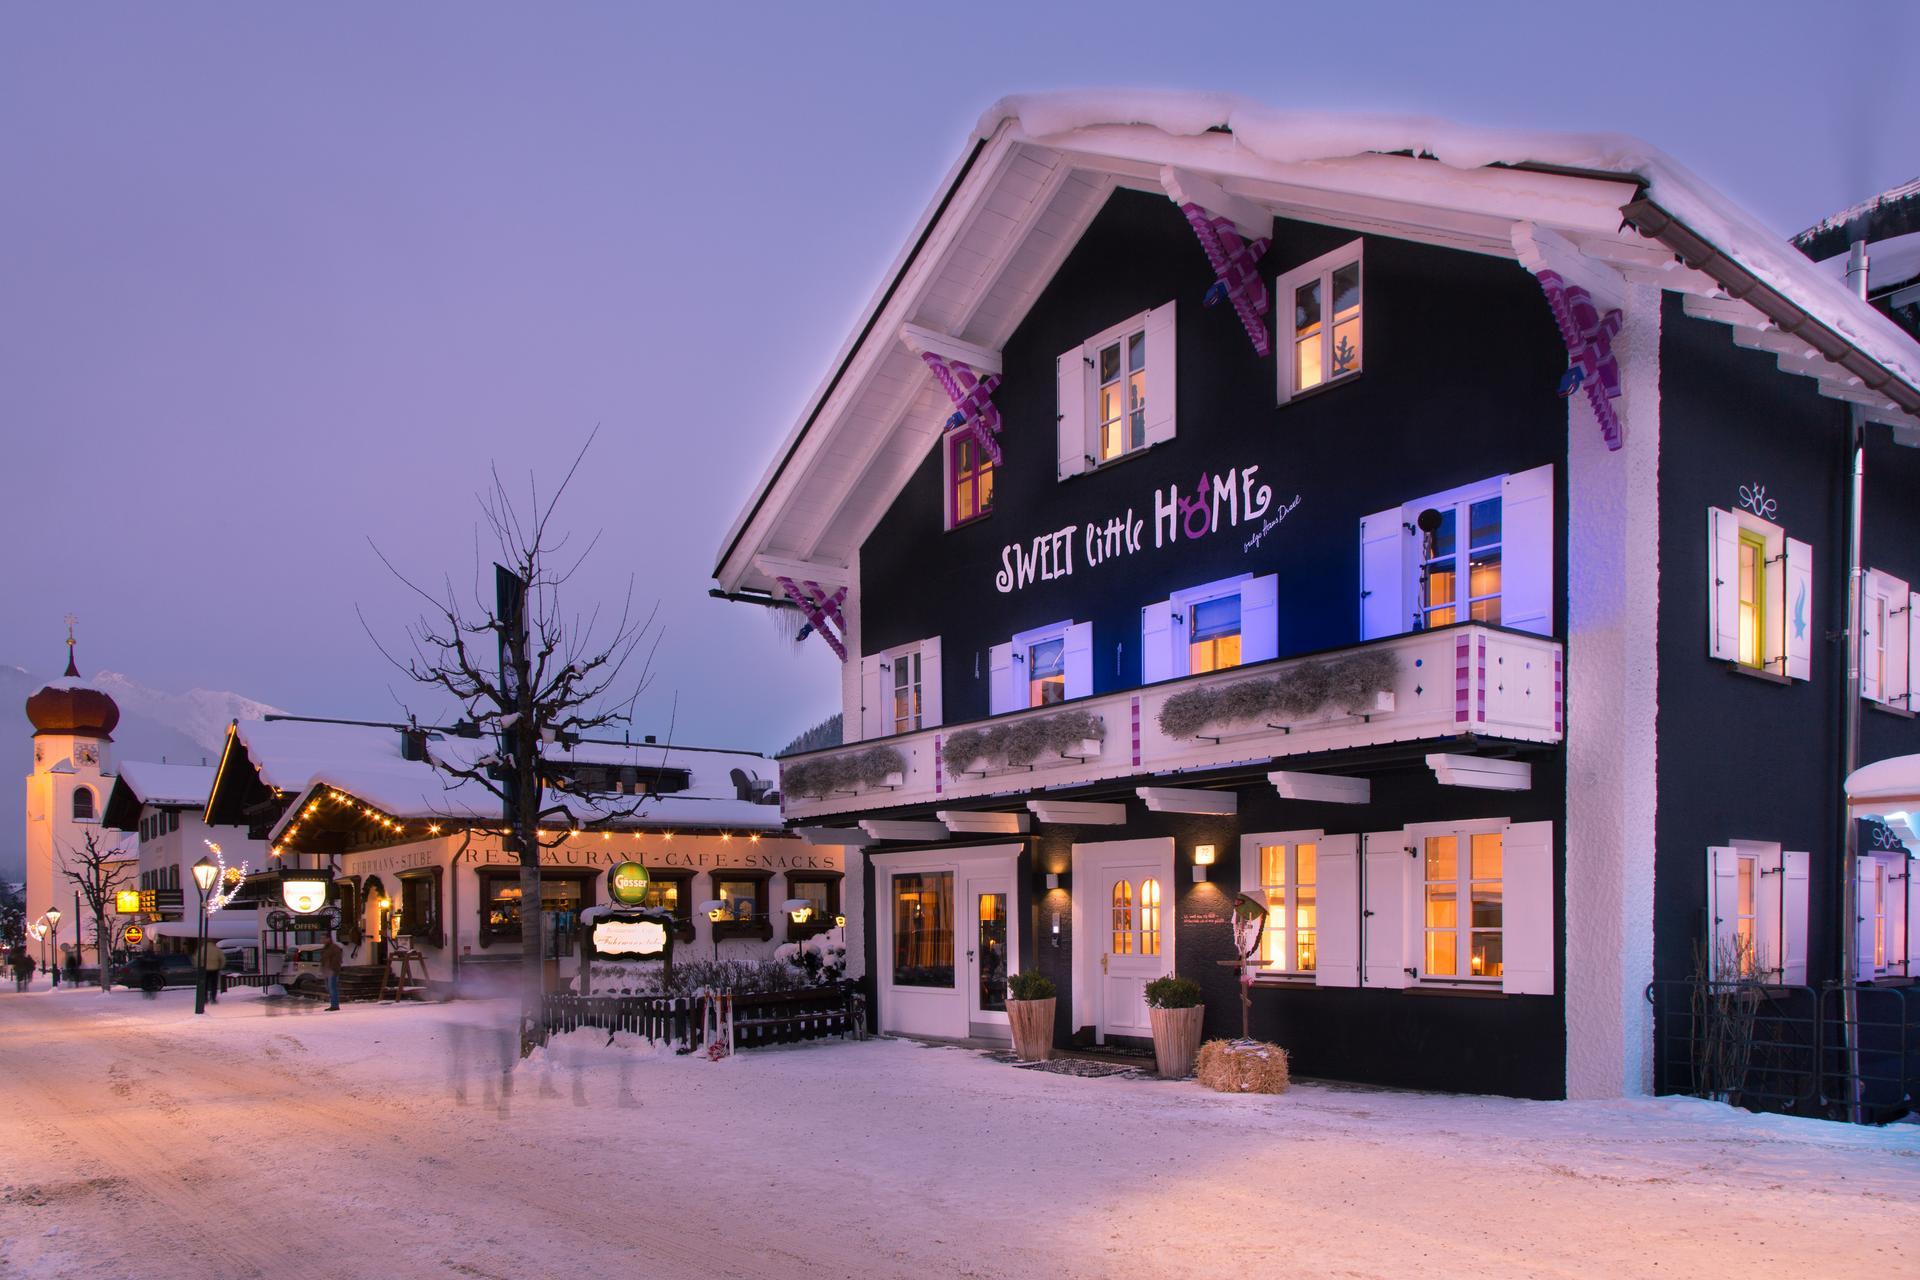 Chalet in St. Anton am Arlberg | Raffl\'s Sweet Little Home